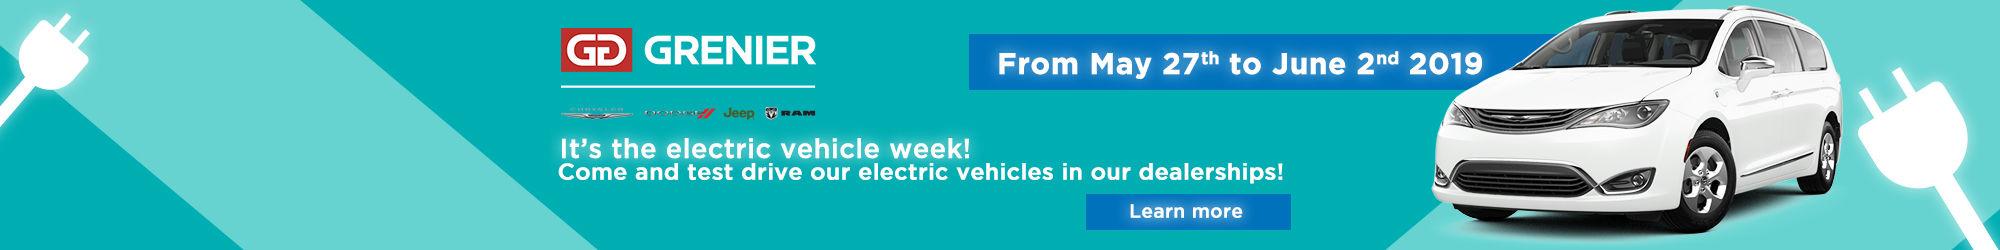 Grenier Chrysler: Electric vehicle week!